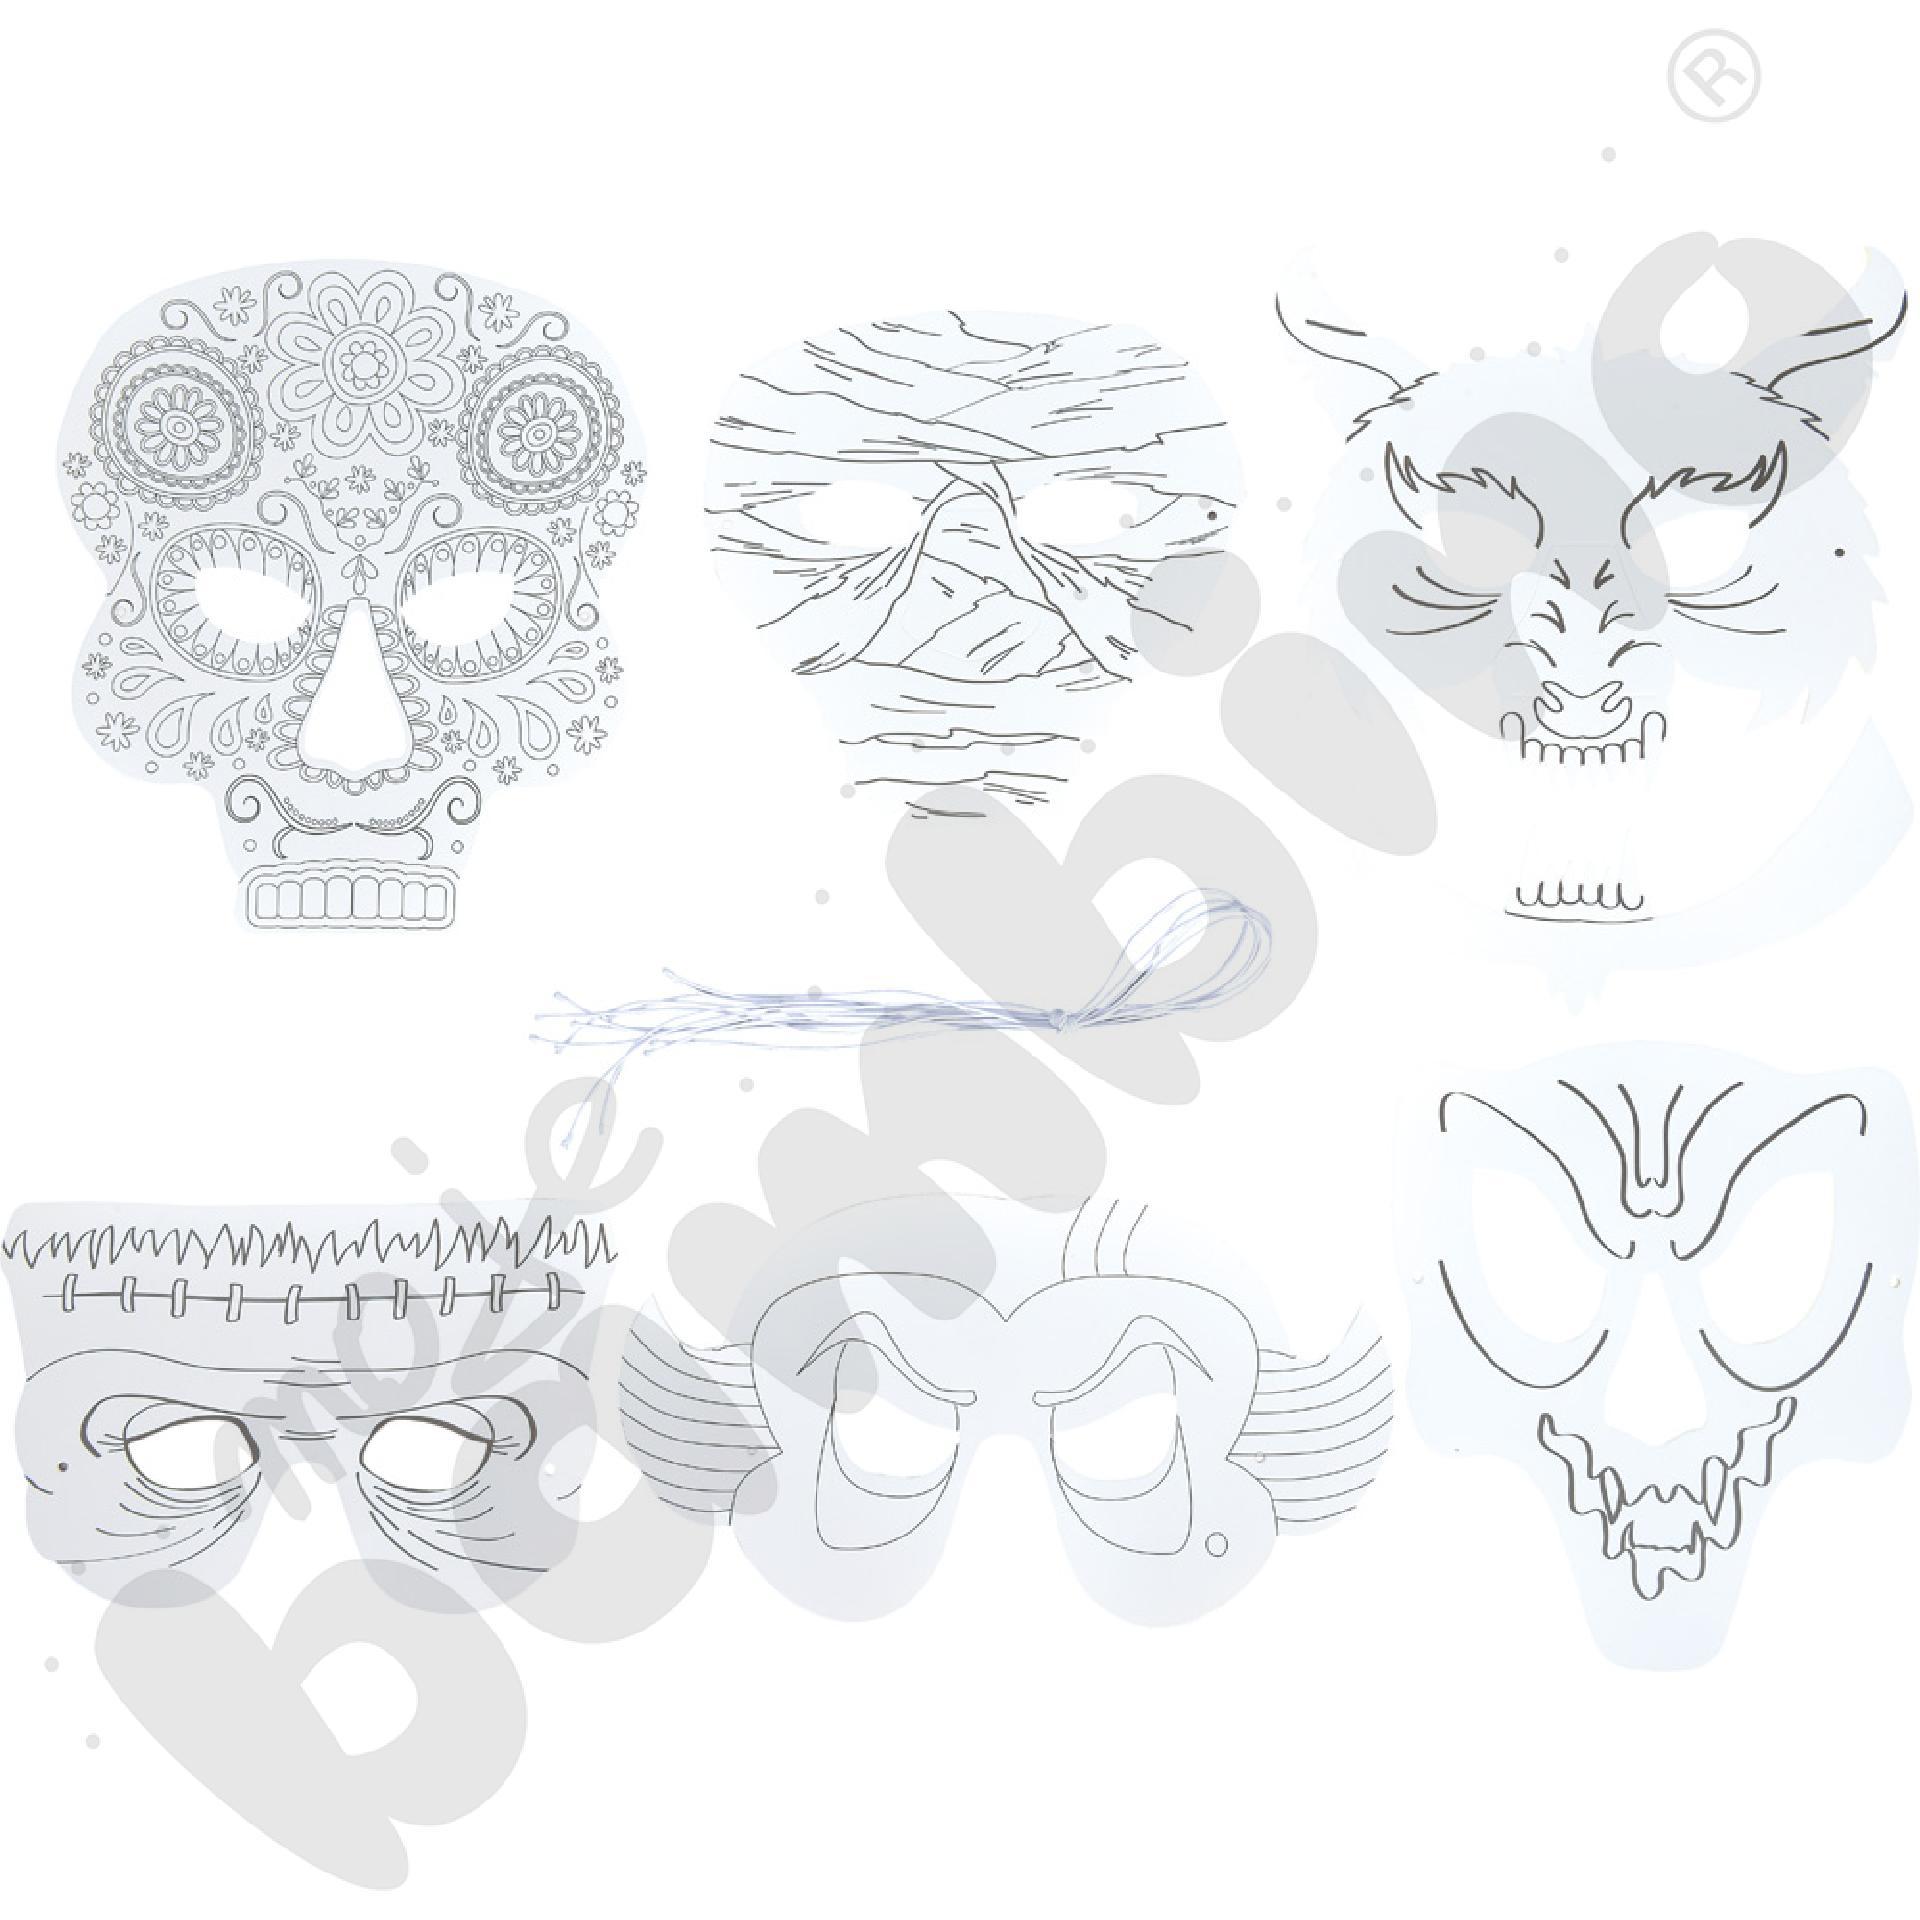 Maski - czarne charaktery